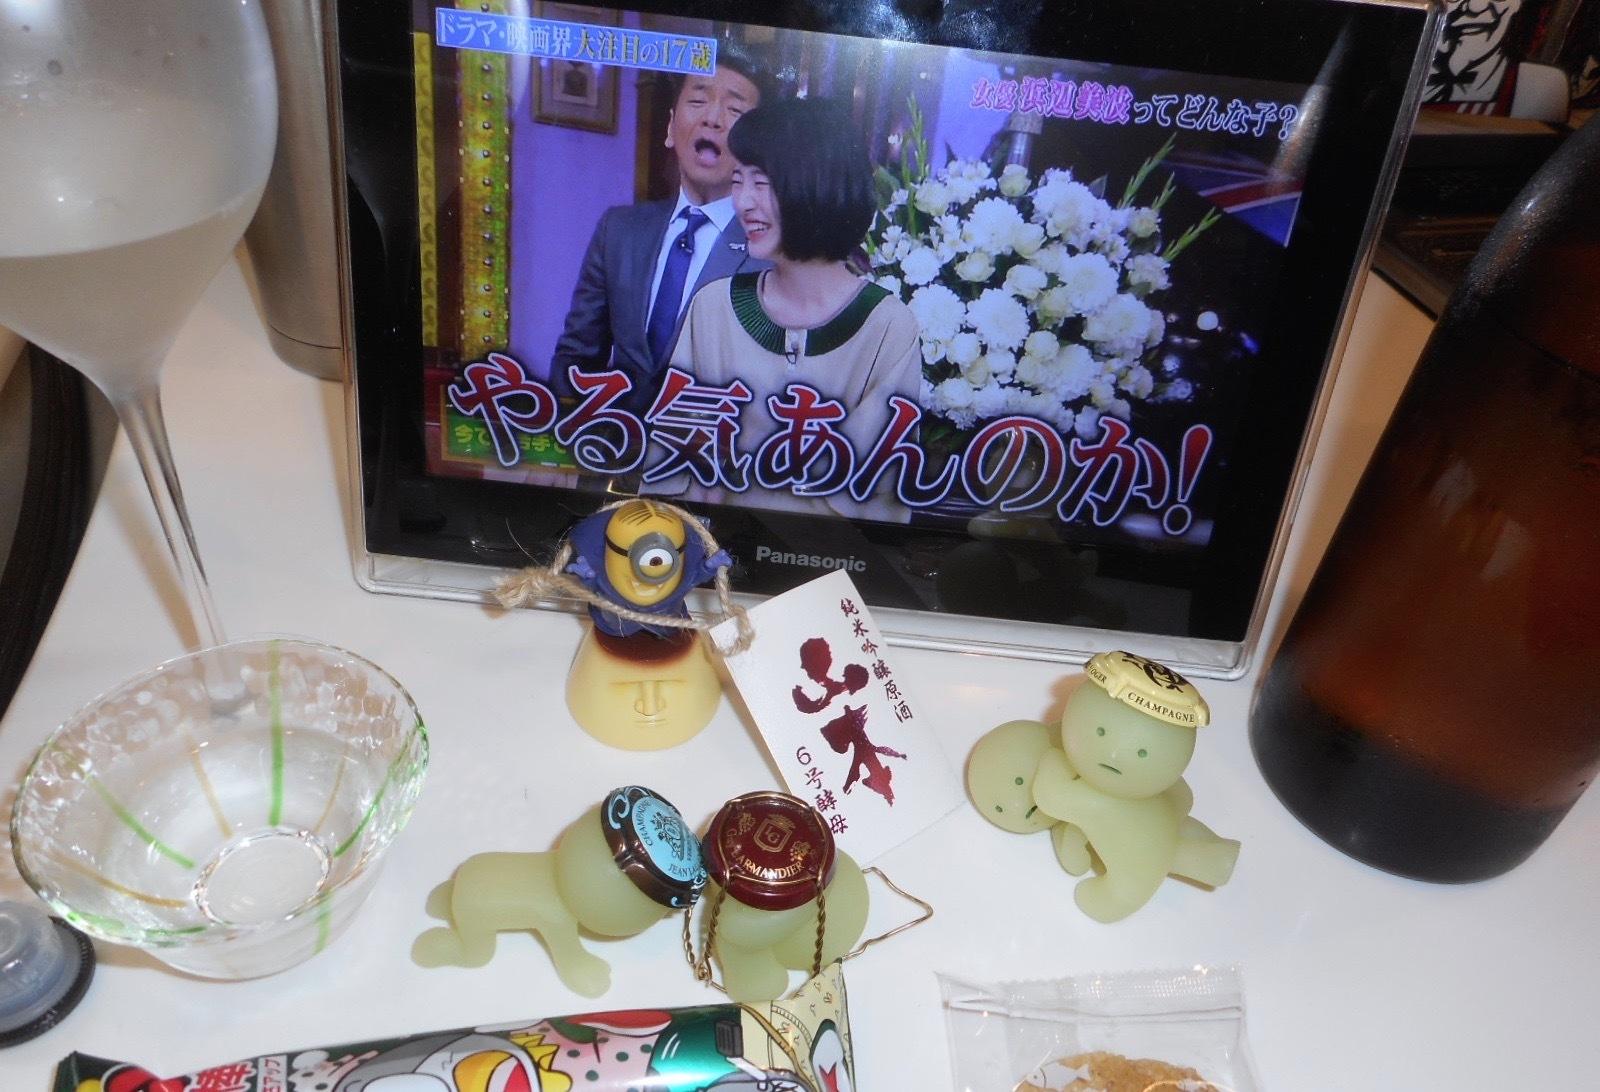 yamamoto_6gou29by6.jpg